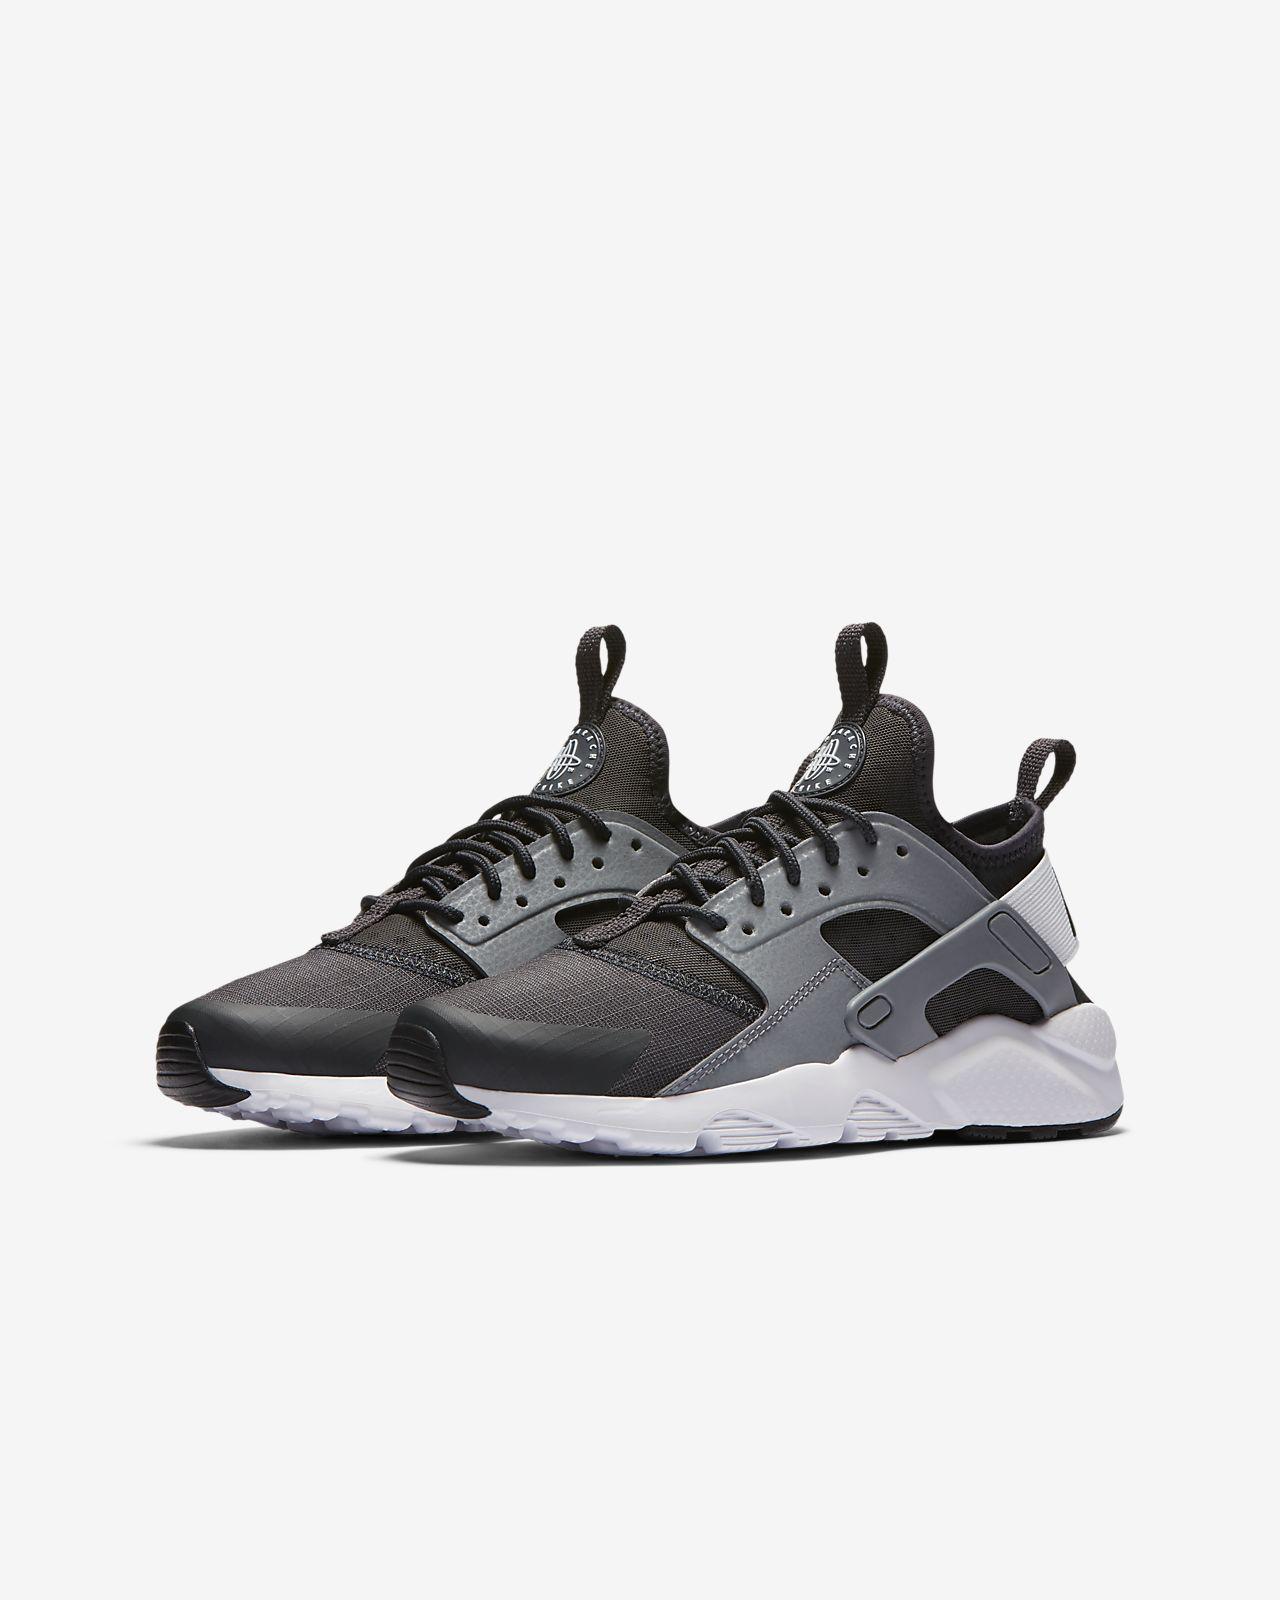 Akciós Nike Huarache Fiu Utcai Cipő Olcsón Nike Cipő